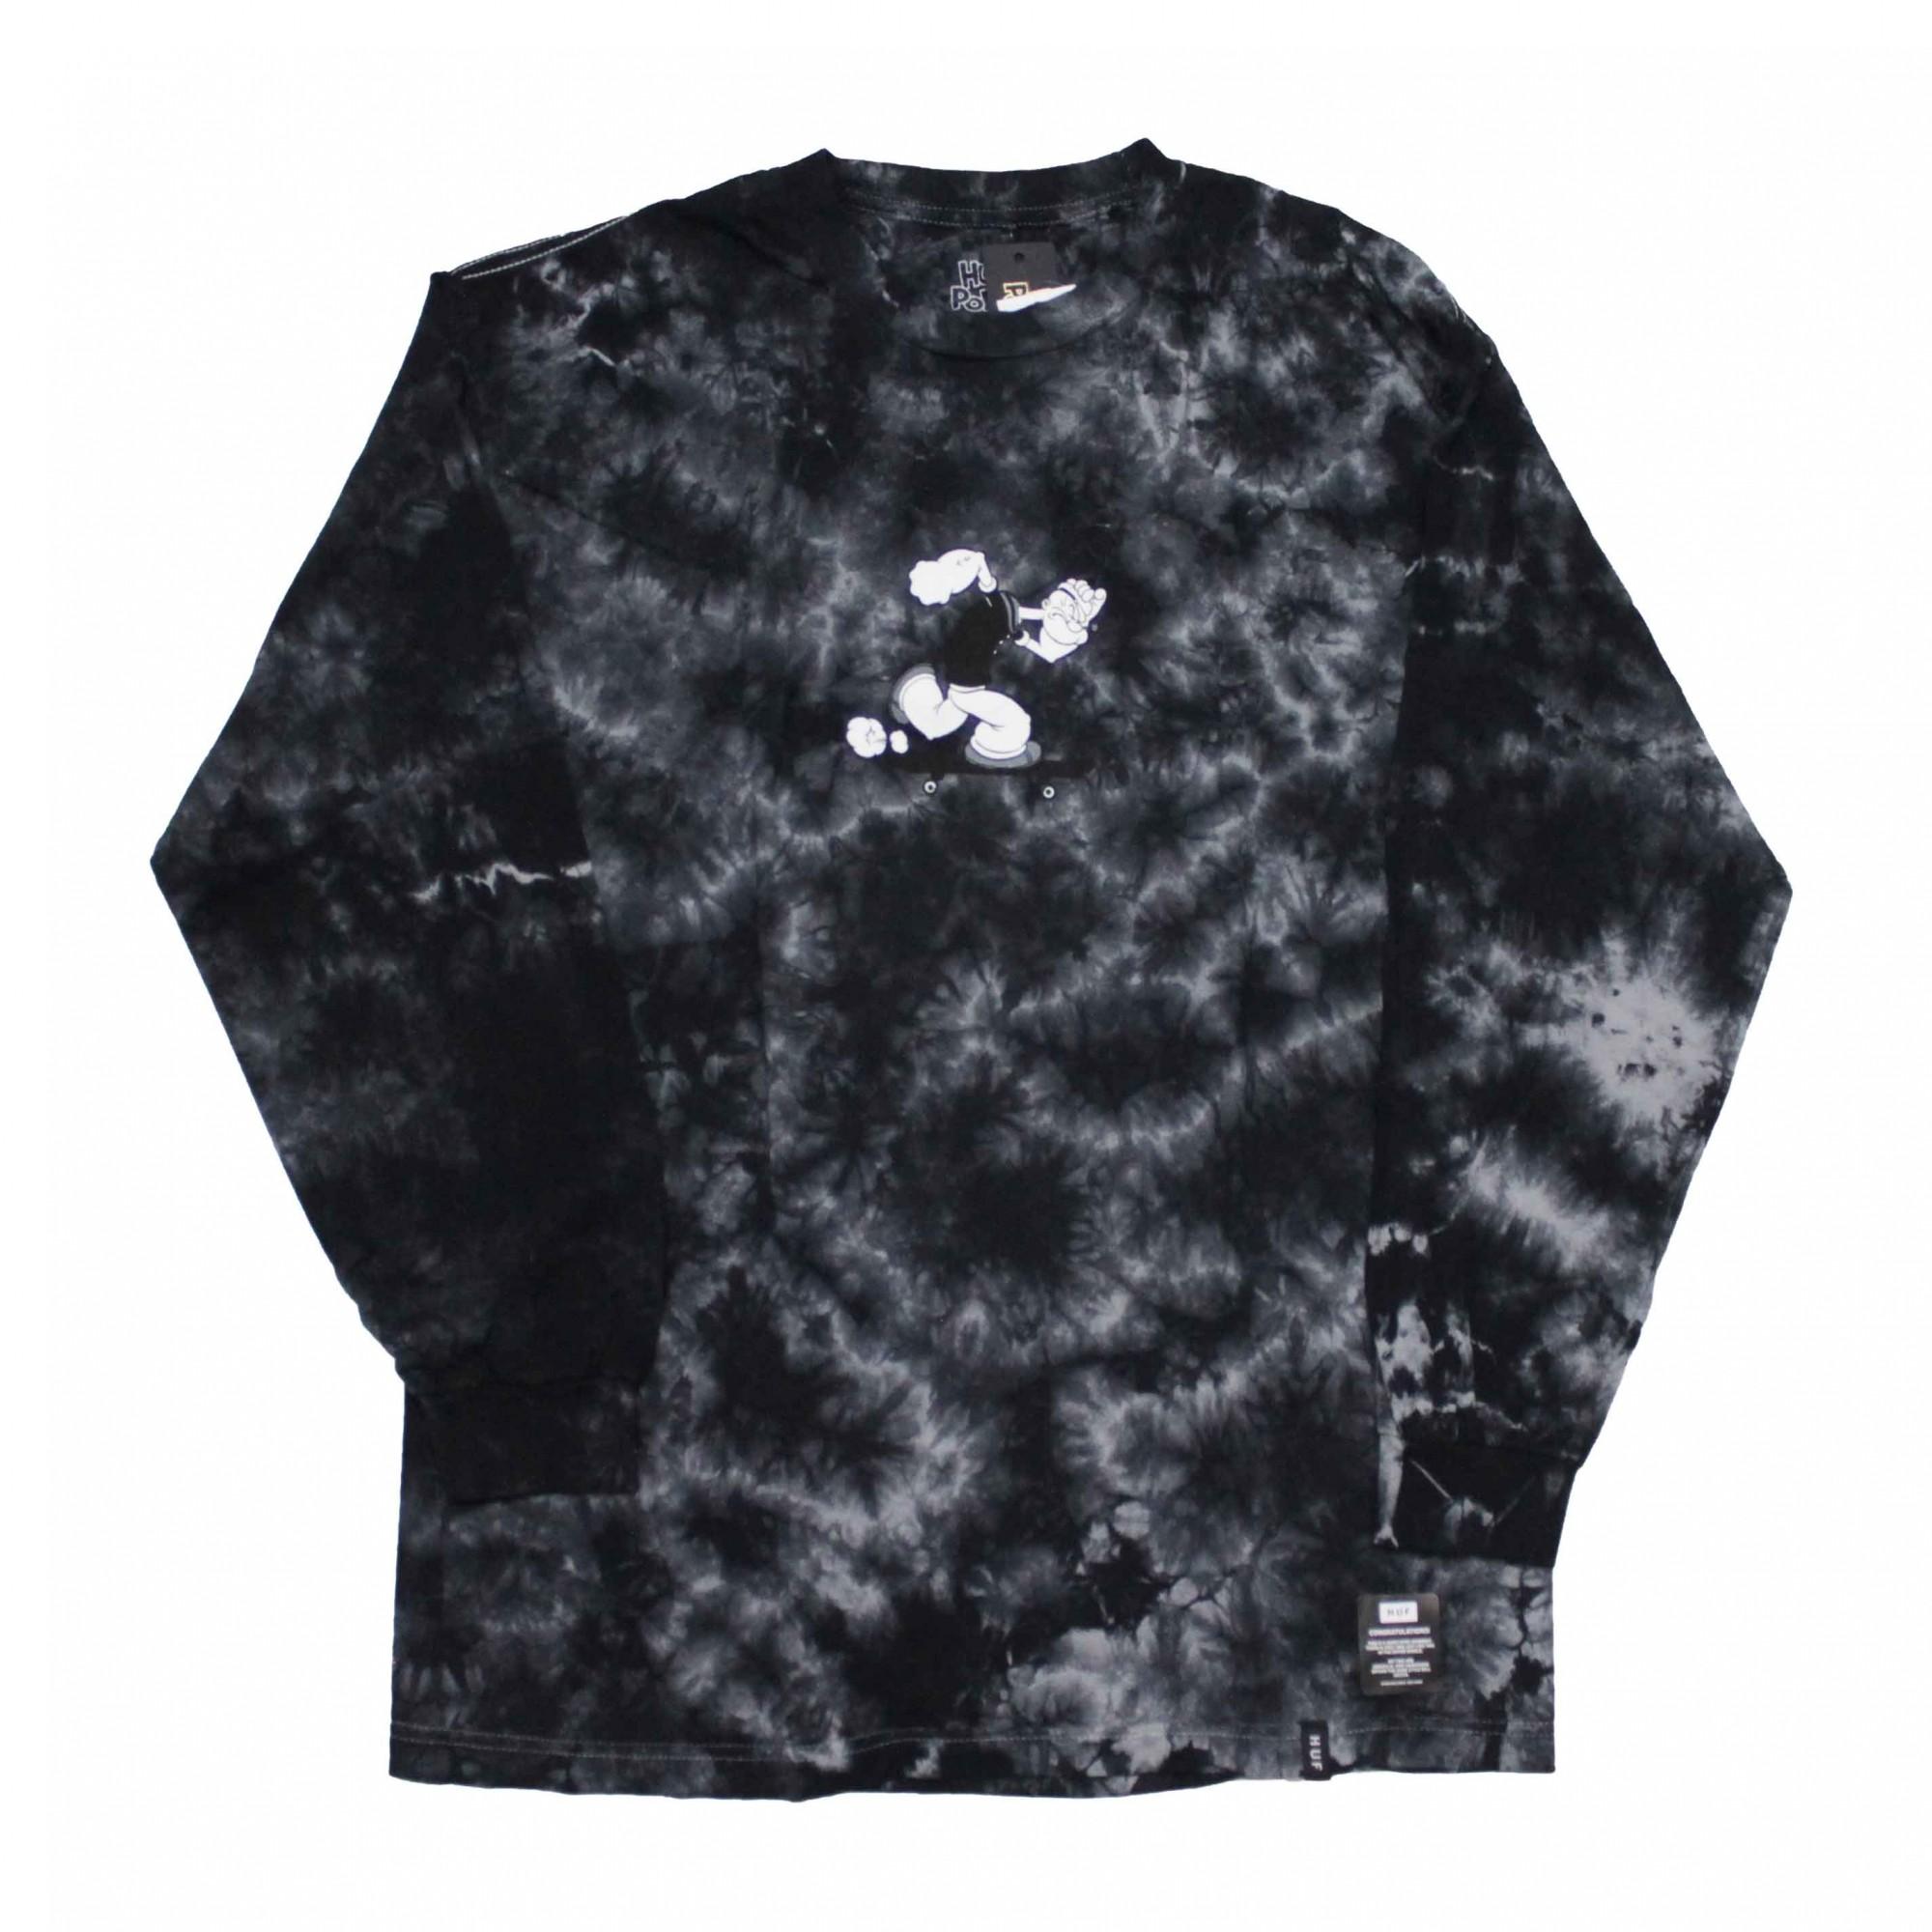 Camiseta Manga Longa HUF x Popeye Skates - Tie Dye Preto (Importado)